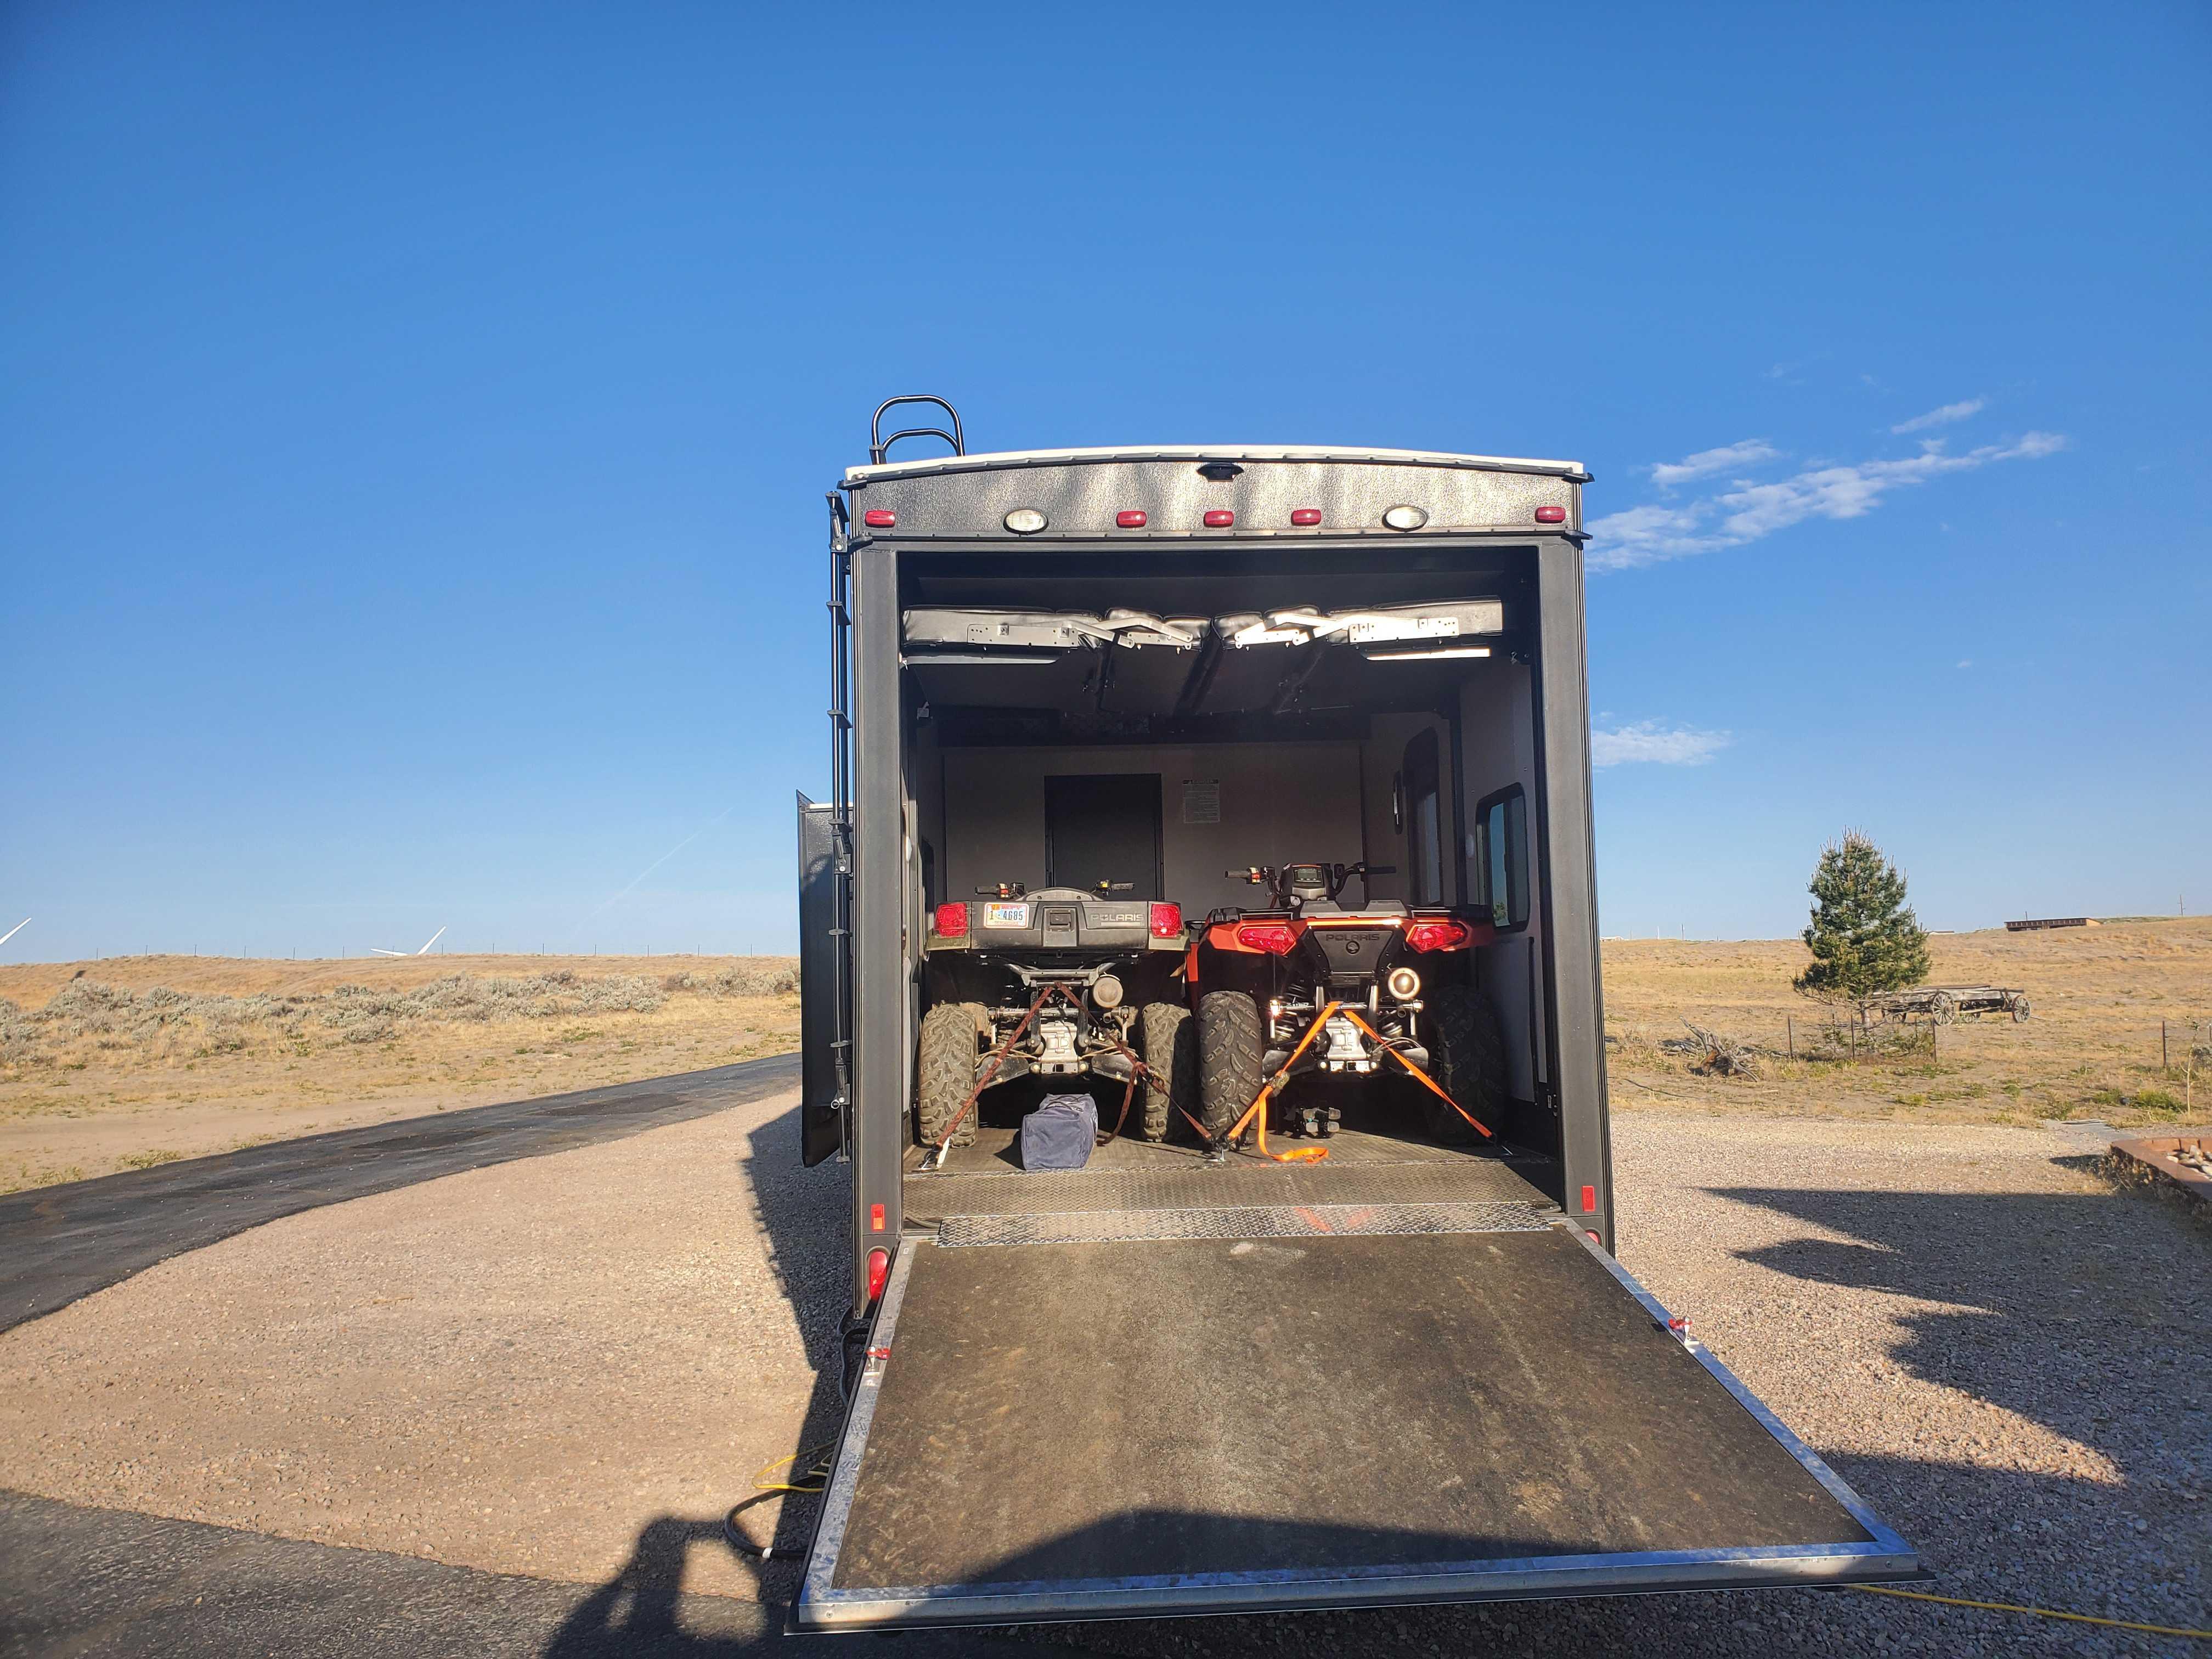 13 Foot Garage can hold (2) ATVs or (1)Polaris Ranger or (1) SidexSide. K-Z Sportster 2019